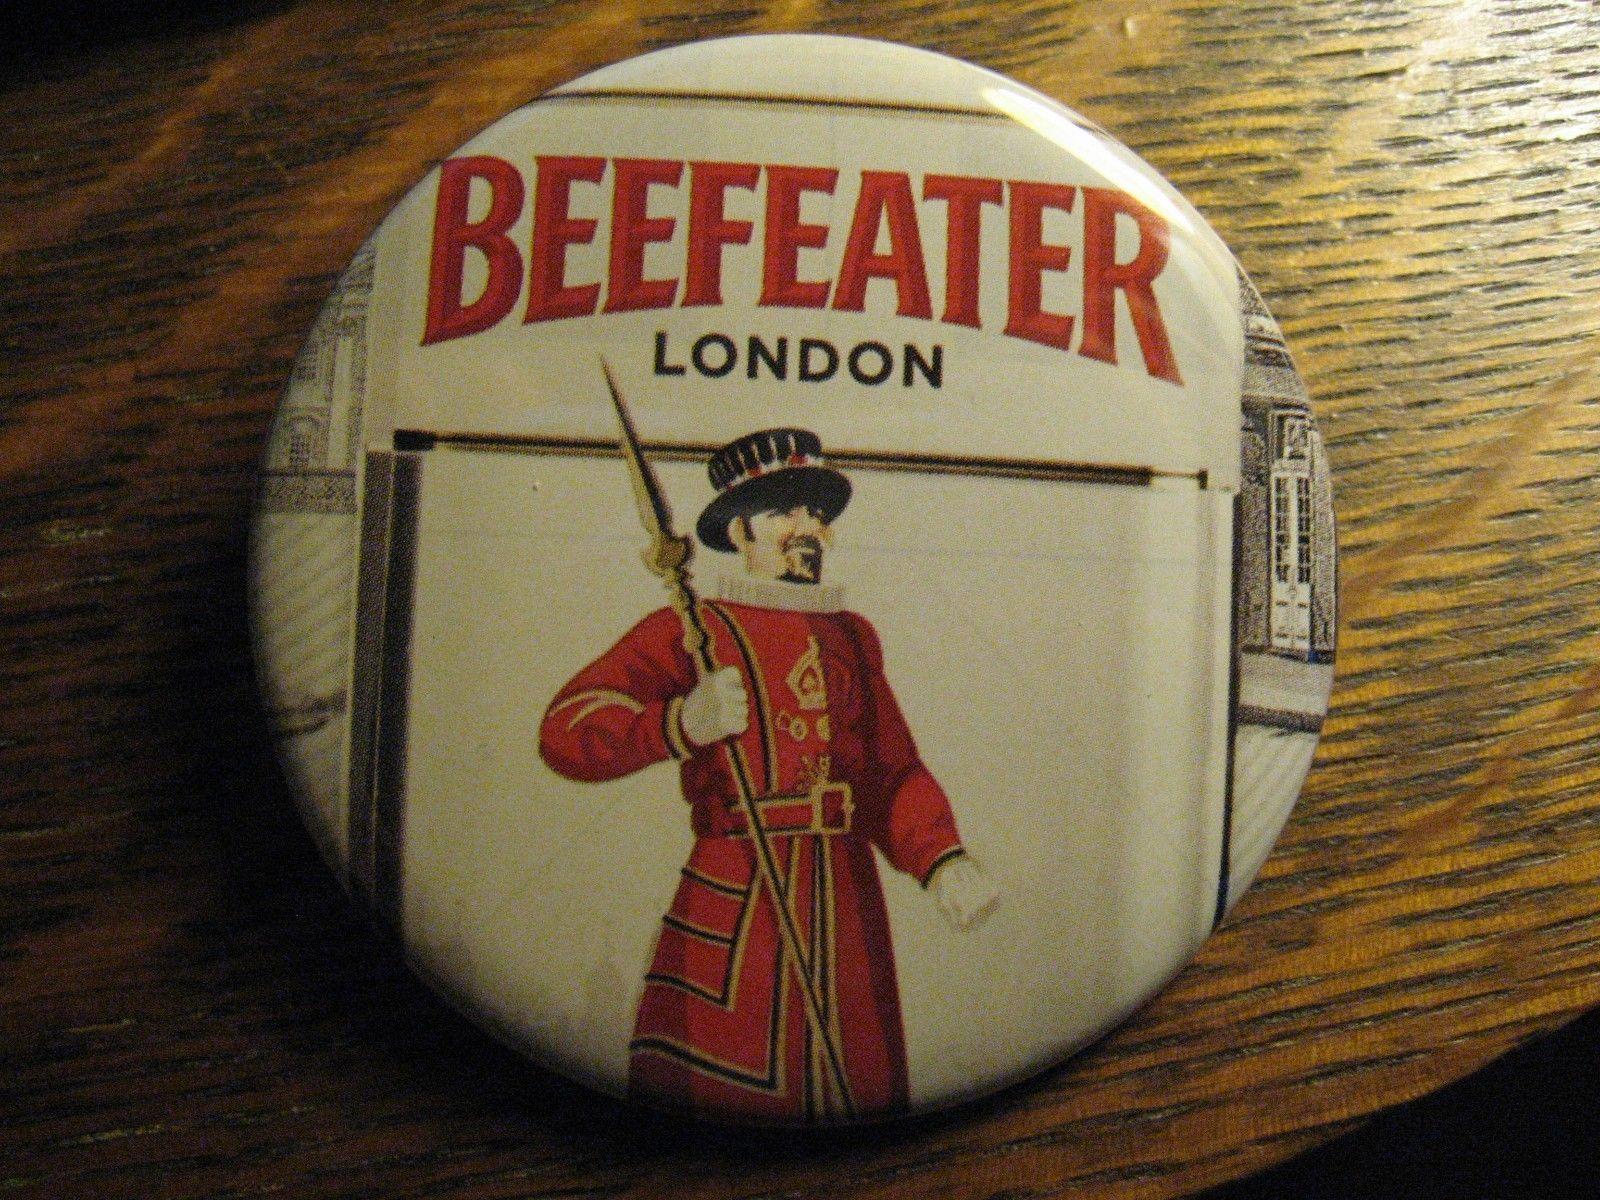 Beefeater London England Vodka Bottle Label Logo Advertisement Lapel Button Pin